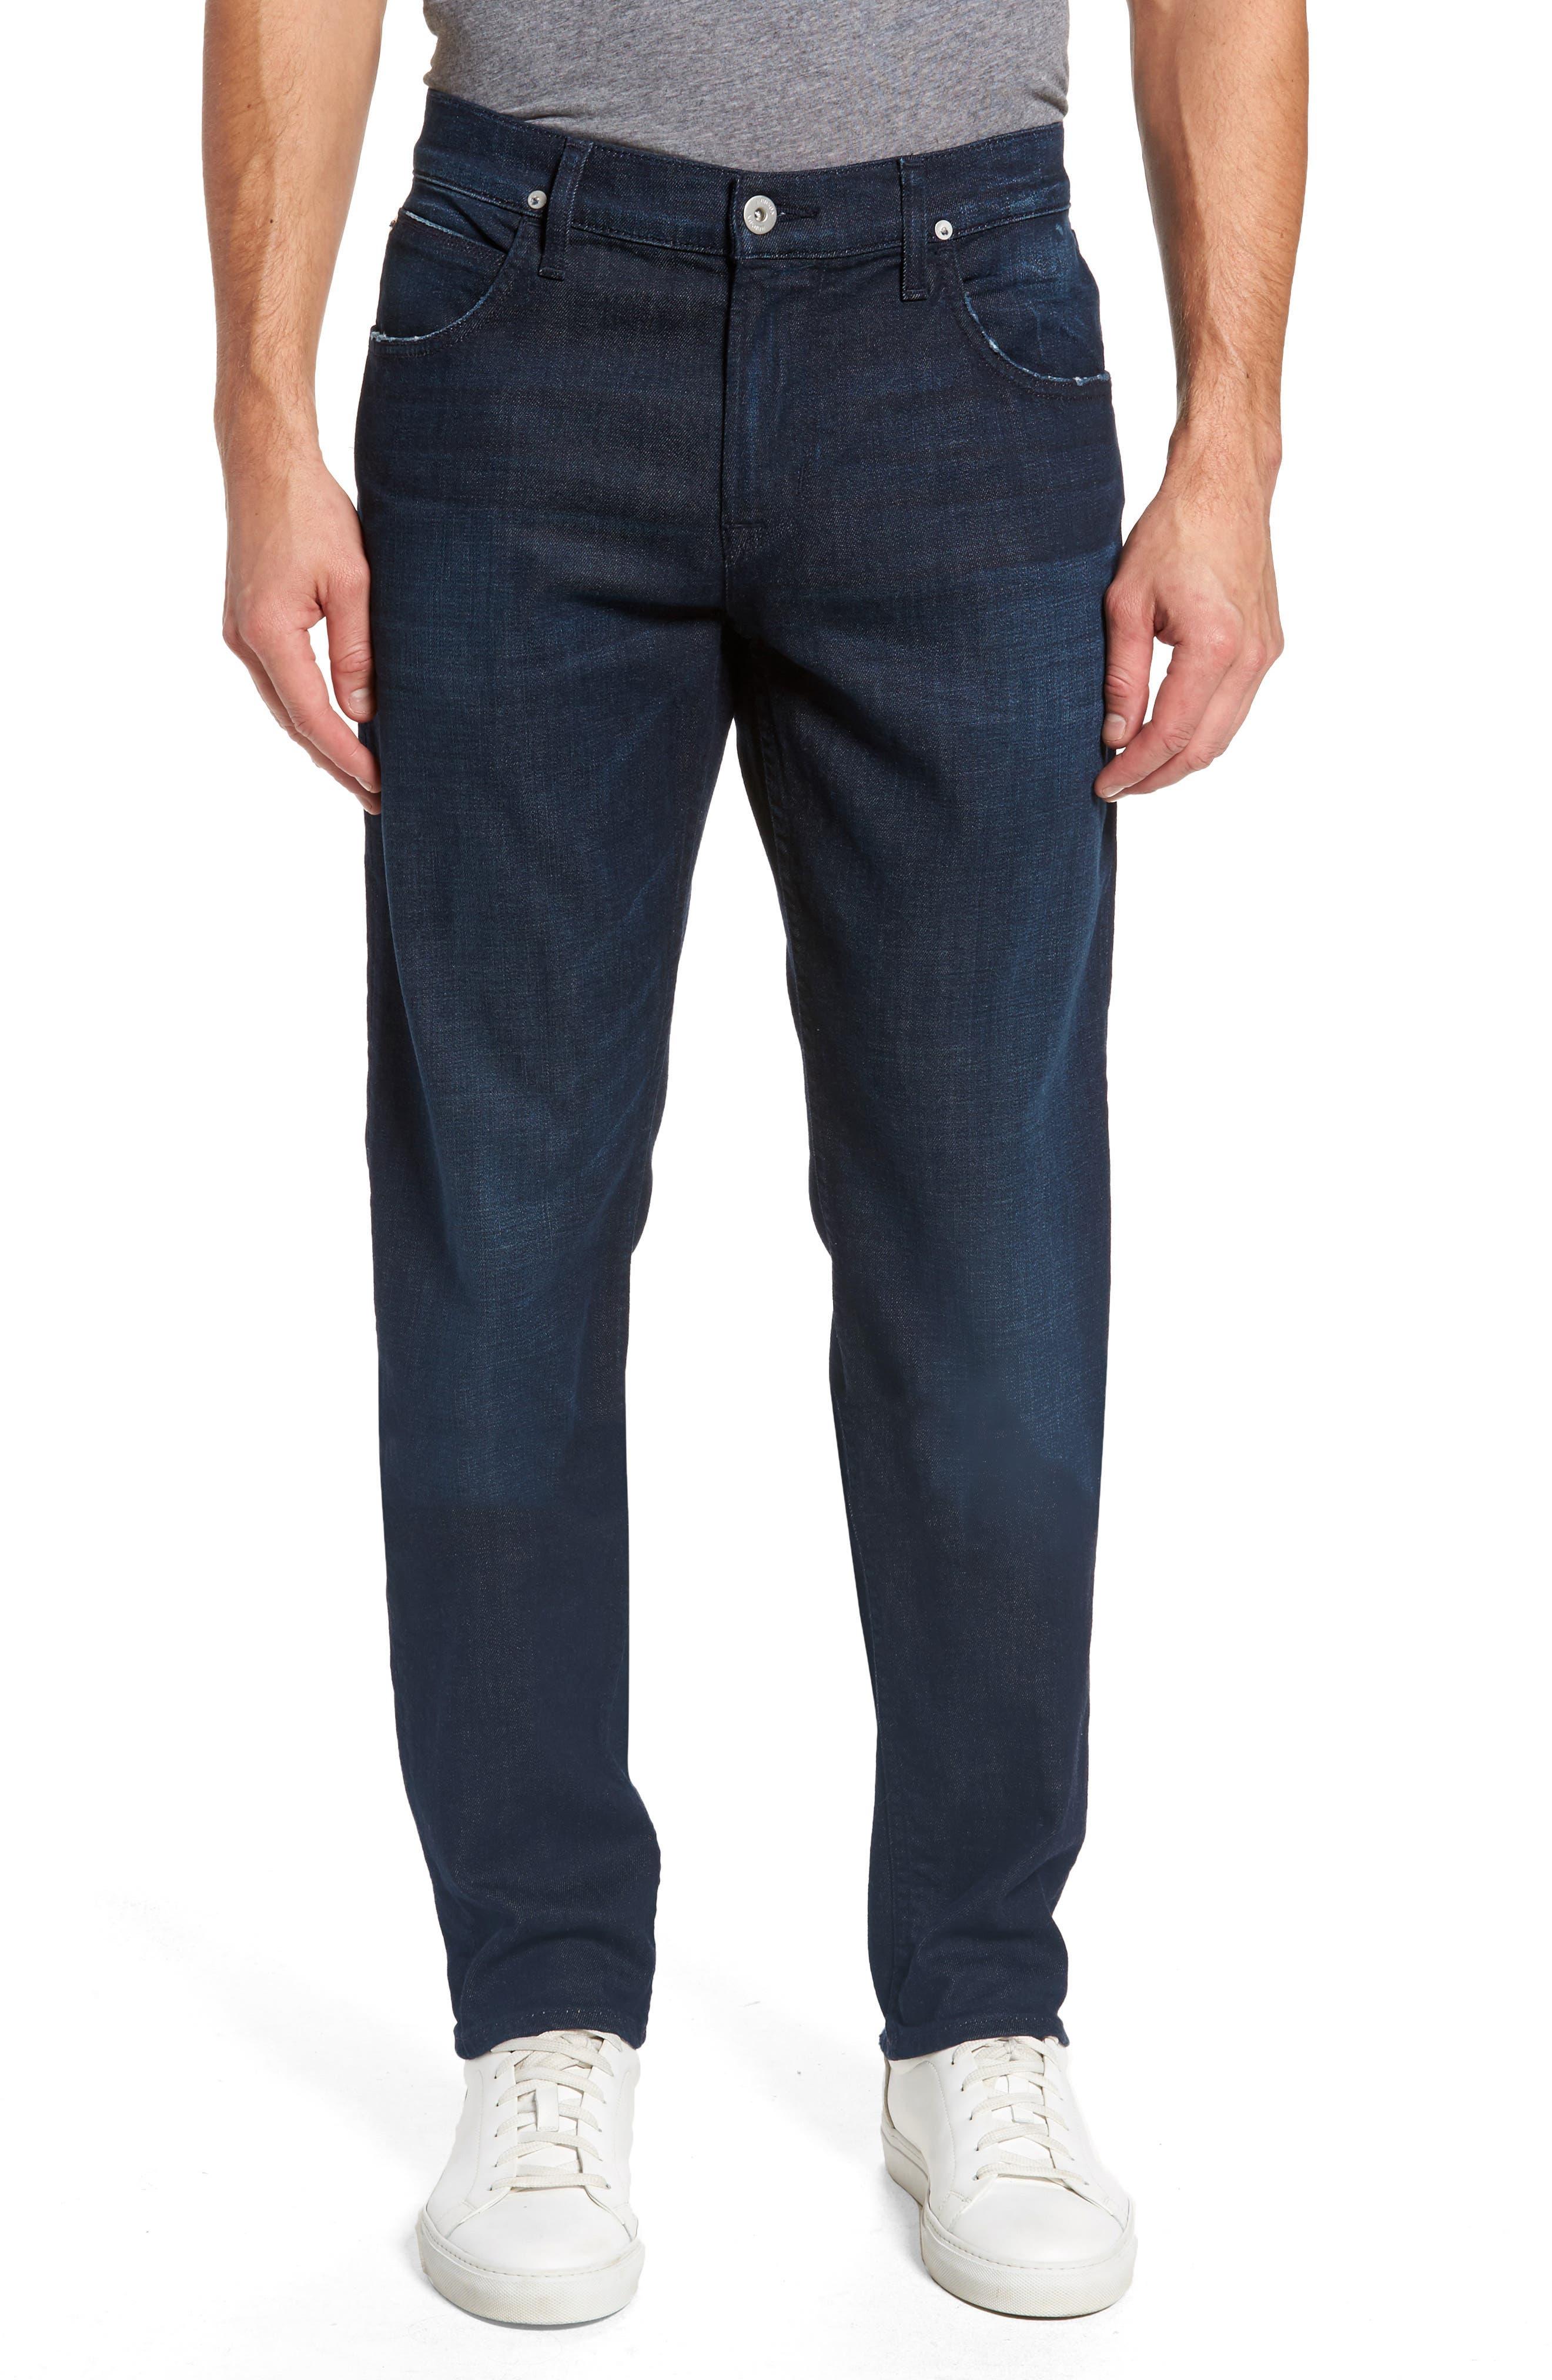 Blake Slim Fit Jeans,                         Main,                         color, EVENING HUSH